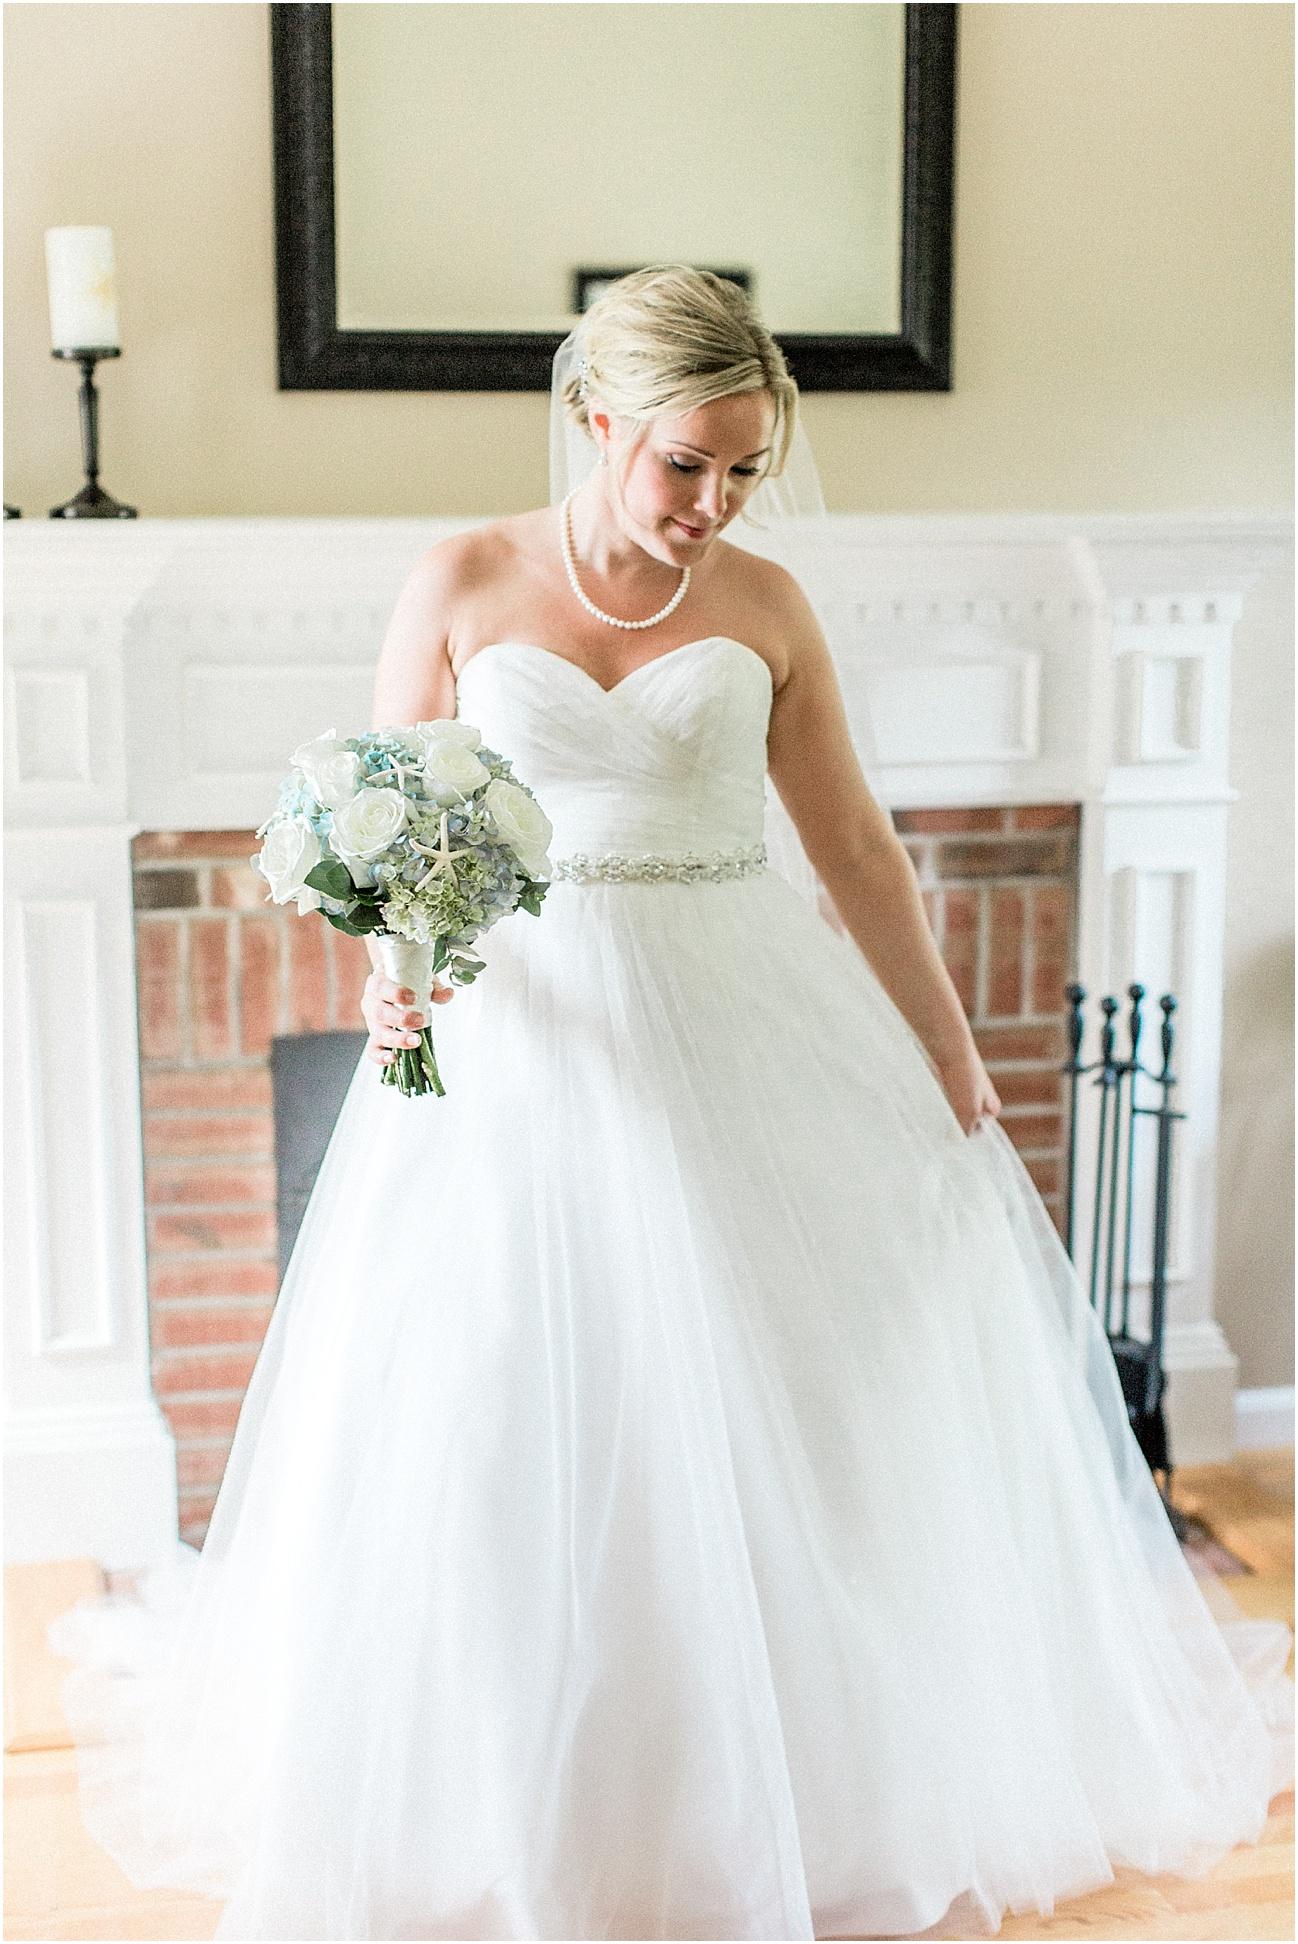 samantha_anthony_sam_old_scituate_light_barker_tavern_south_shore_cape_cod_boston_wedding_photographer_meredith_jane_photography_photo_0278.jpg